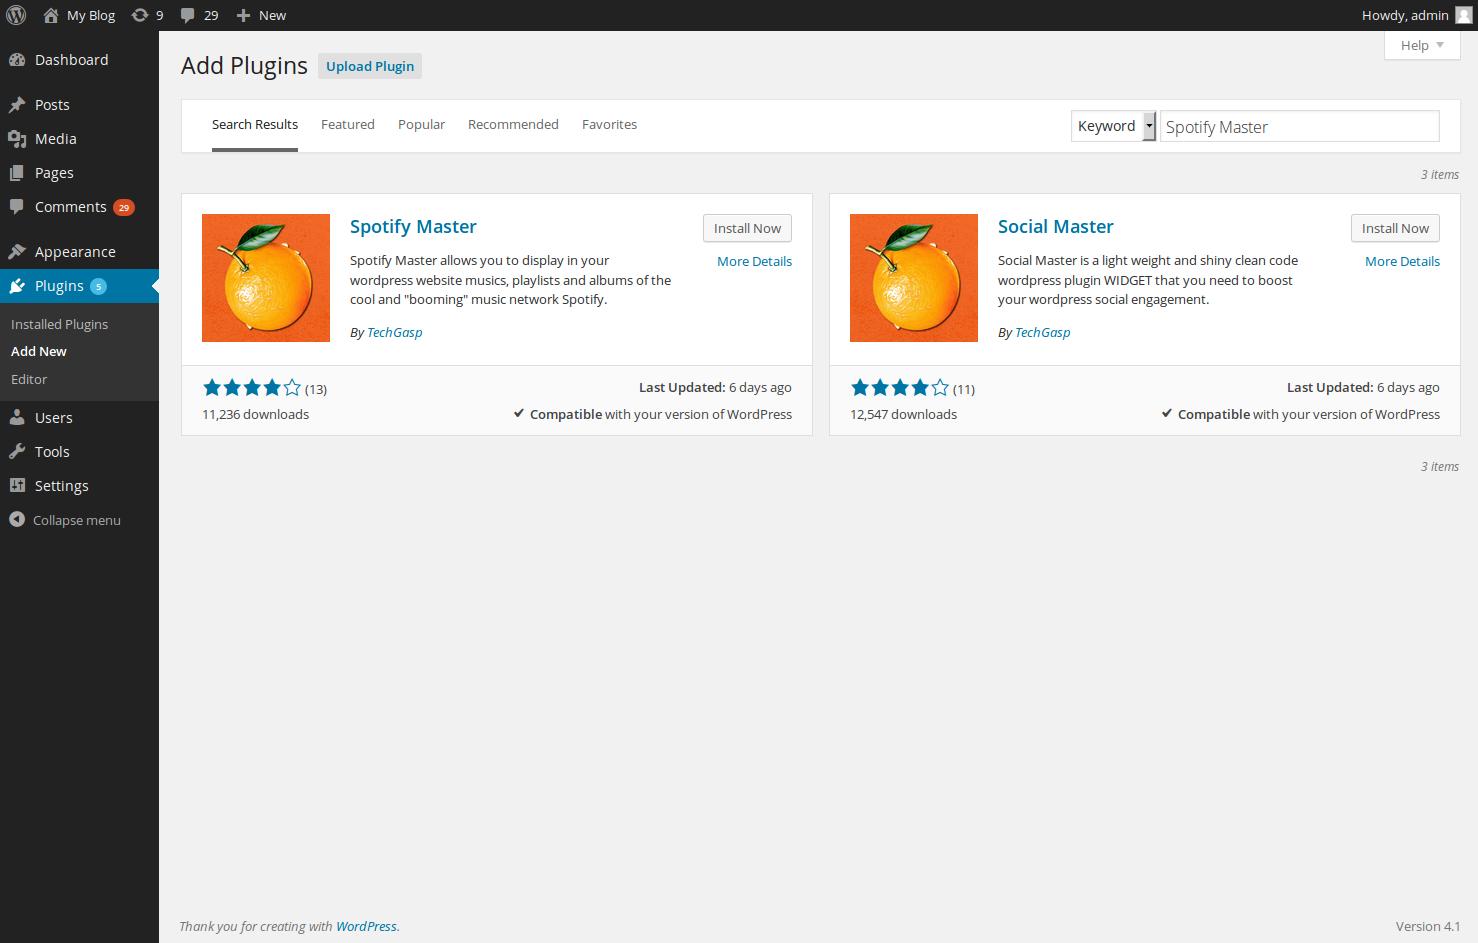 wordpress plugins spotify master 3